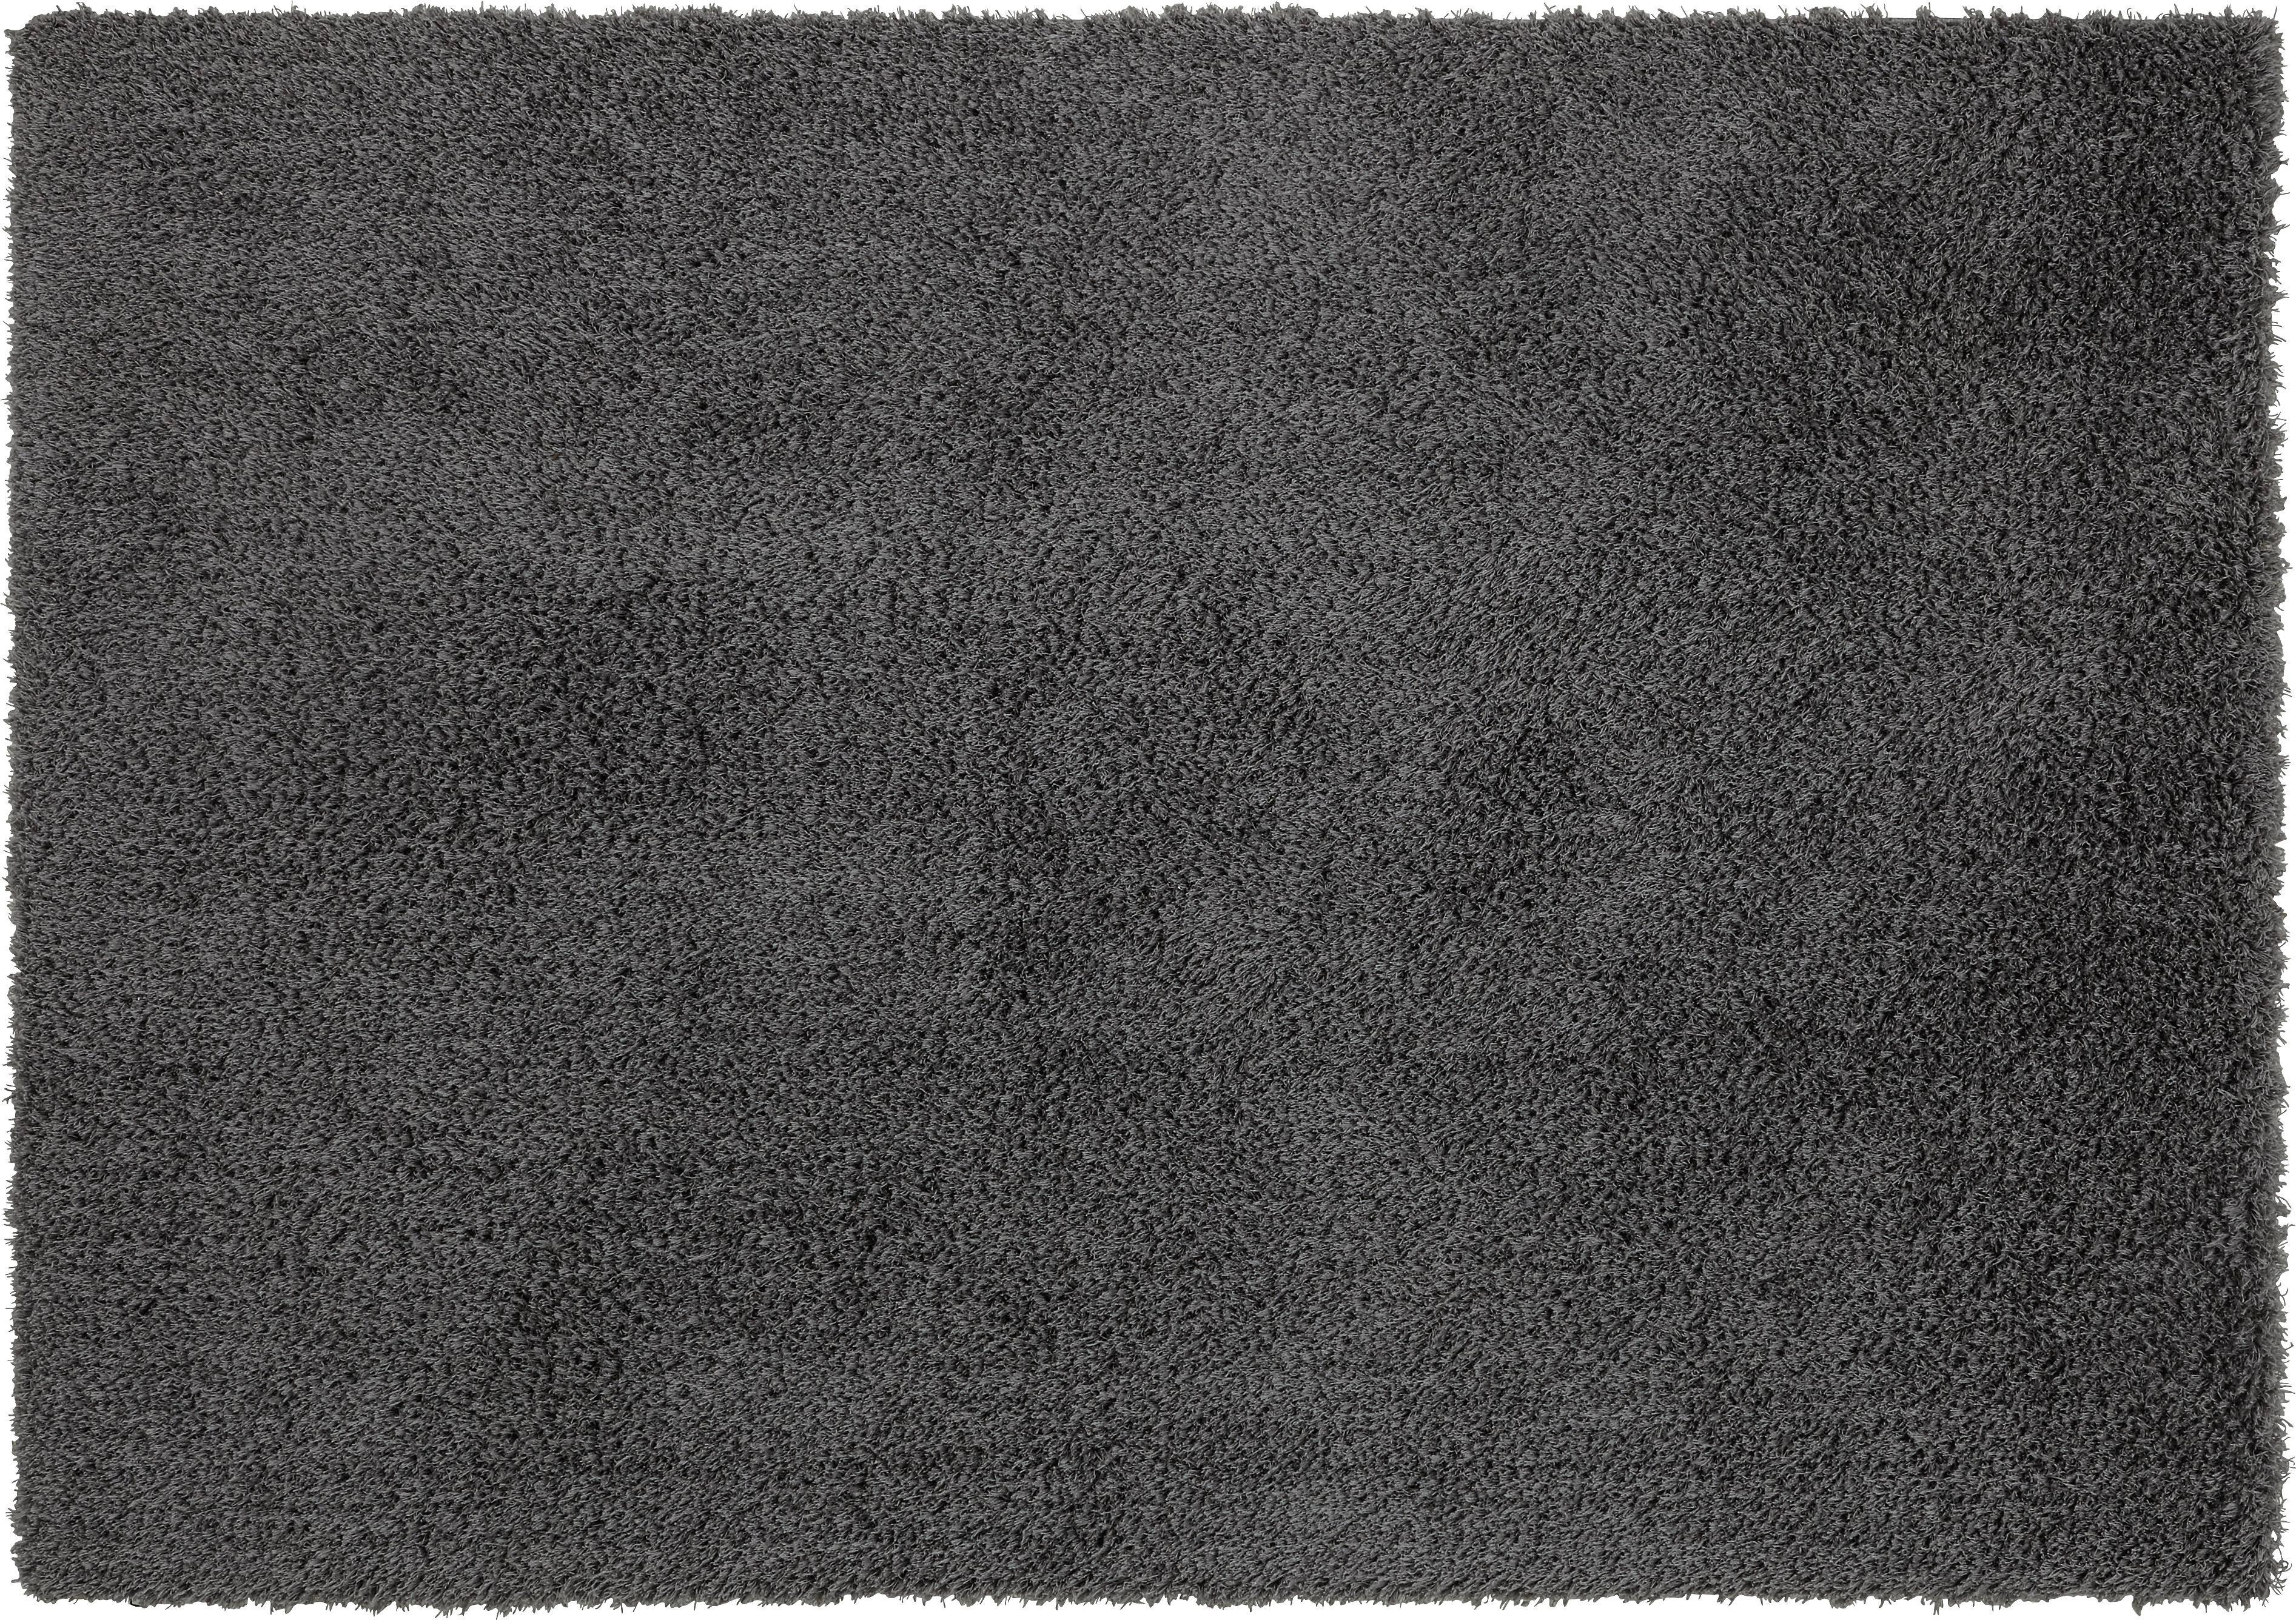 Shaggy Stefan - Hellgrau, MODERN (120/170cm) - MÖMAX modern living